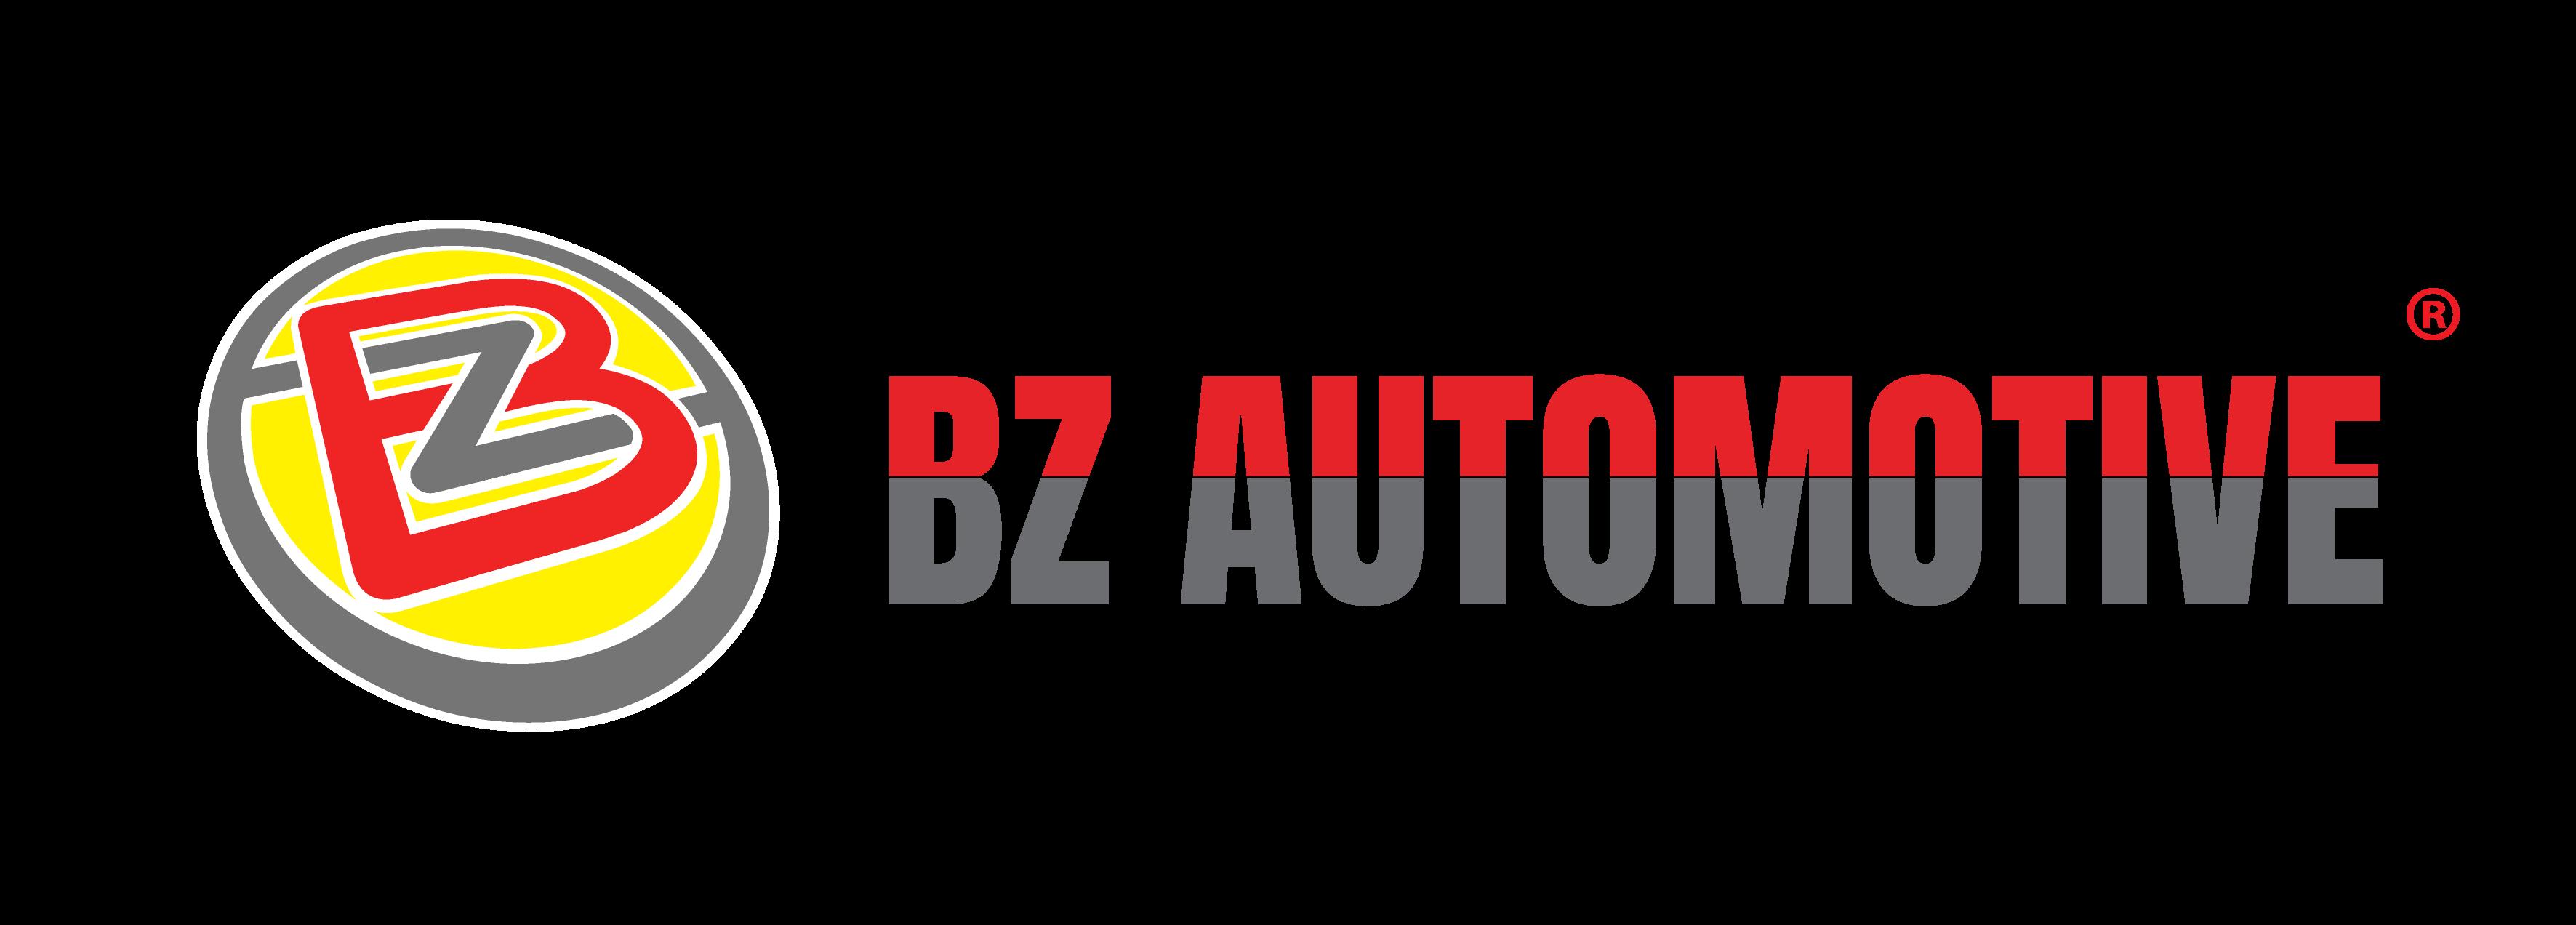 BZ AUTOMOTIVE